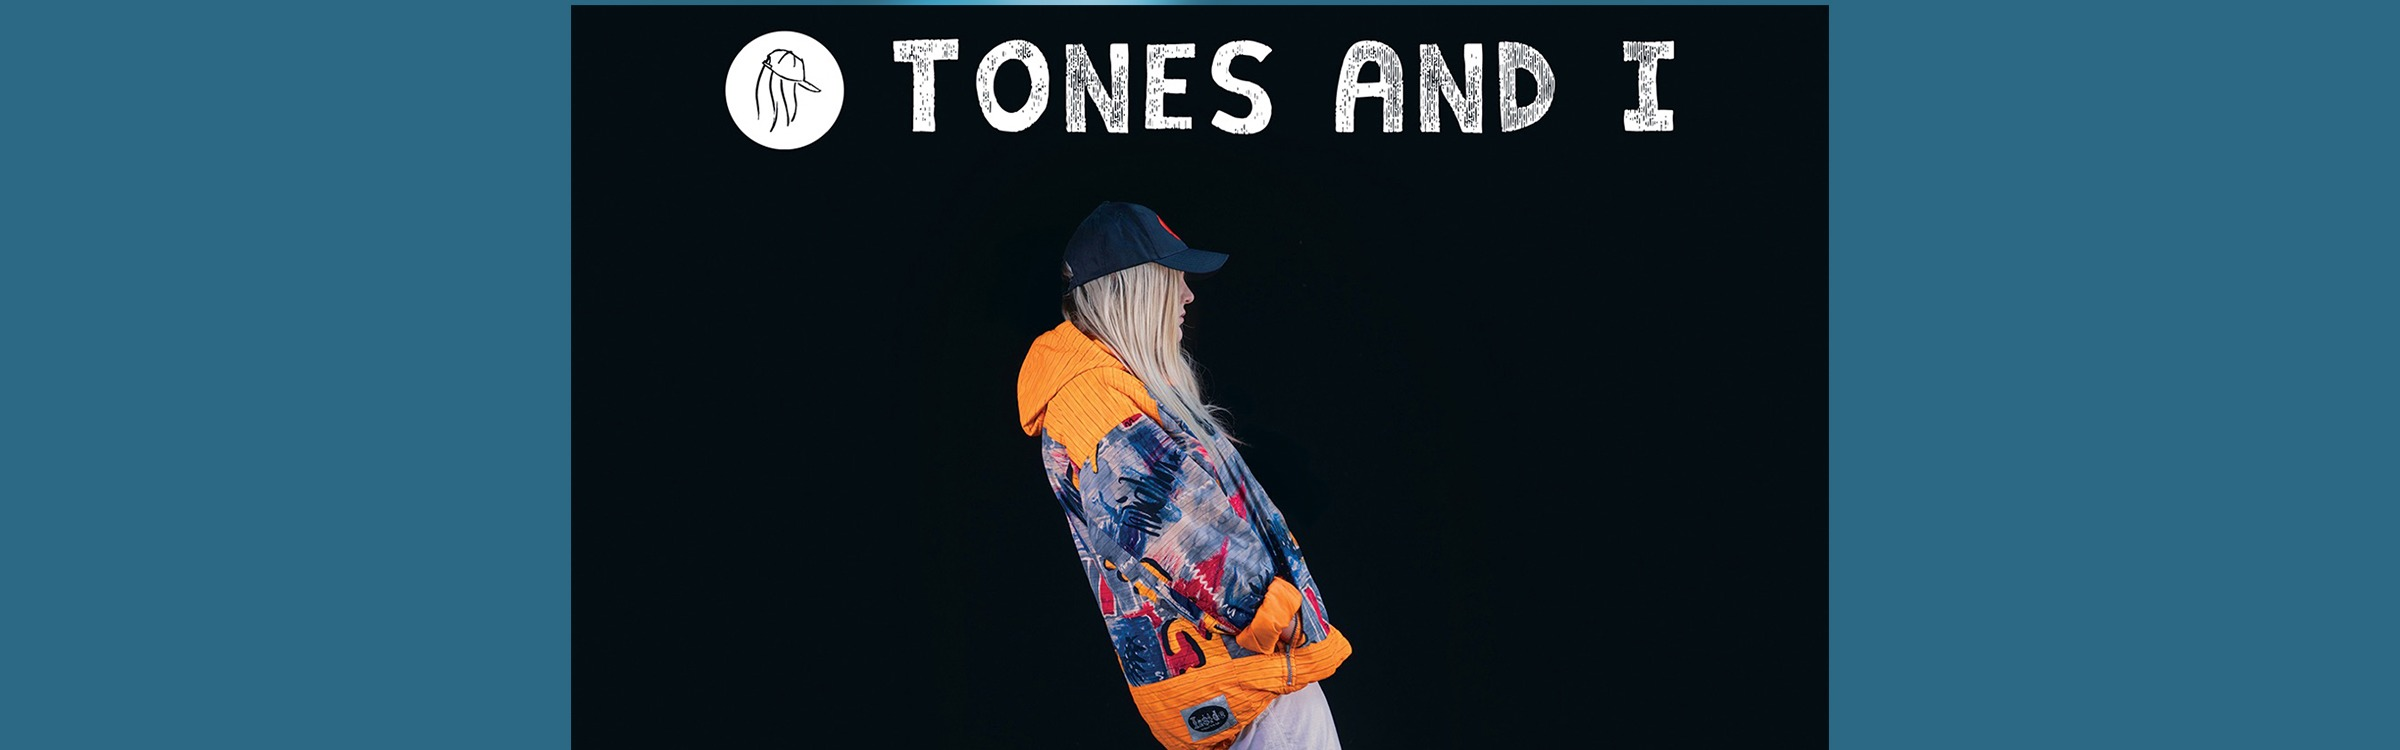 Qmusic teaser muziekpag top40